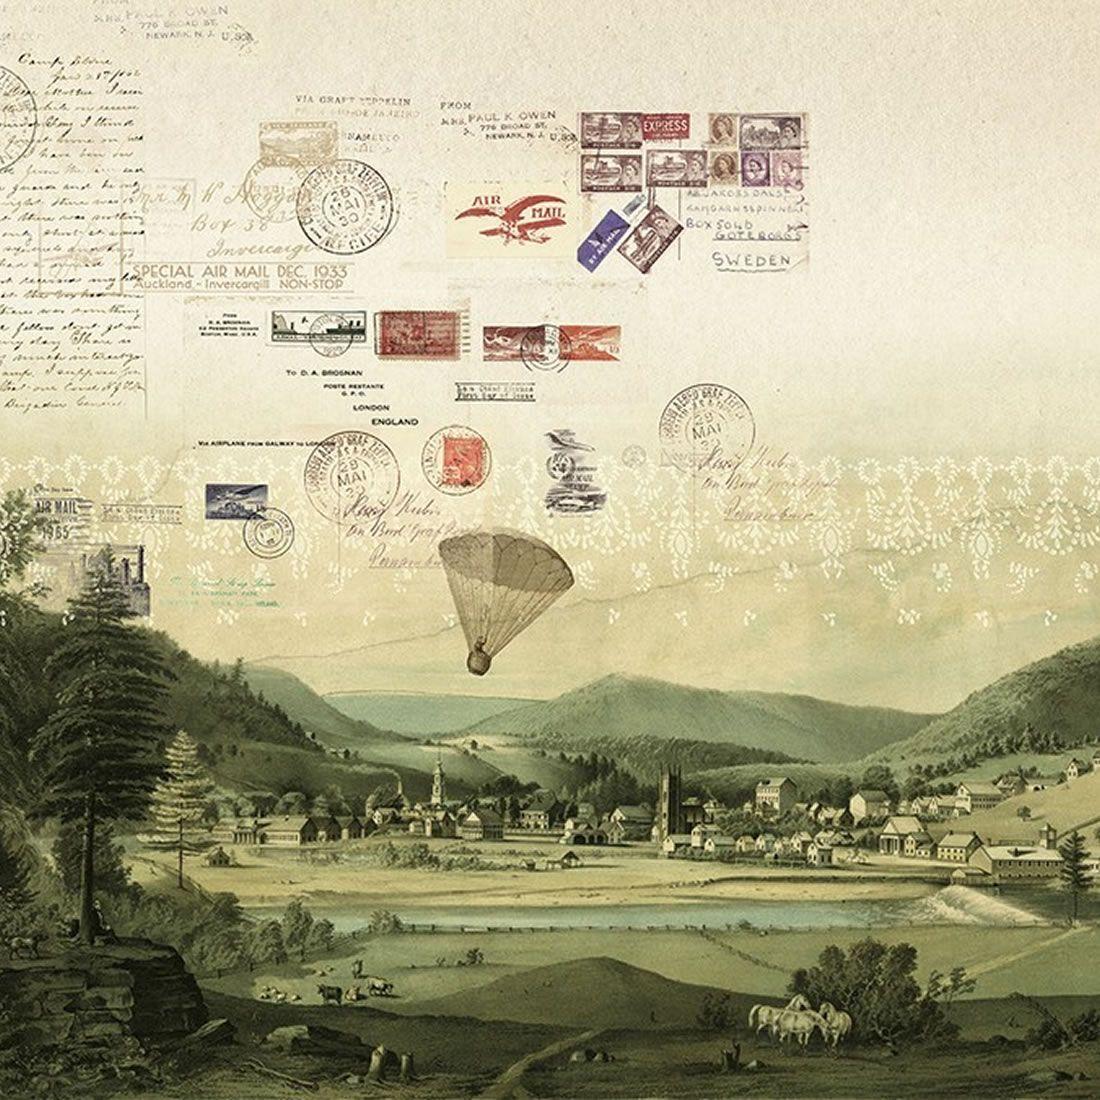 Mural Stamps del catálogo Journeys de Tres tintas